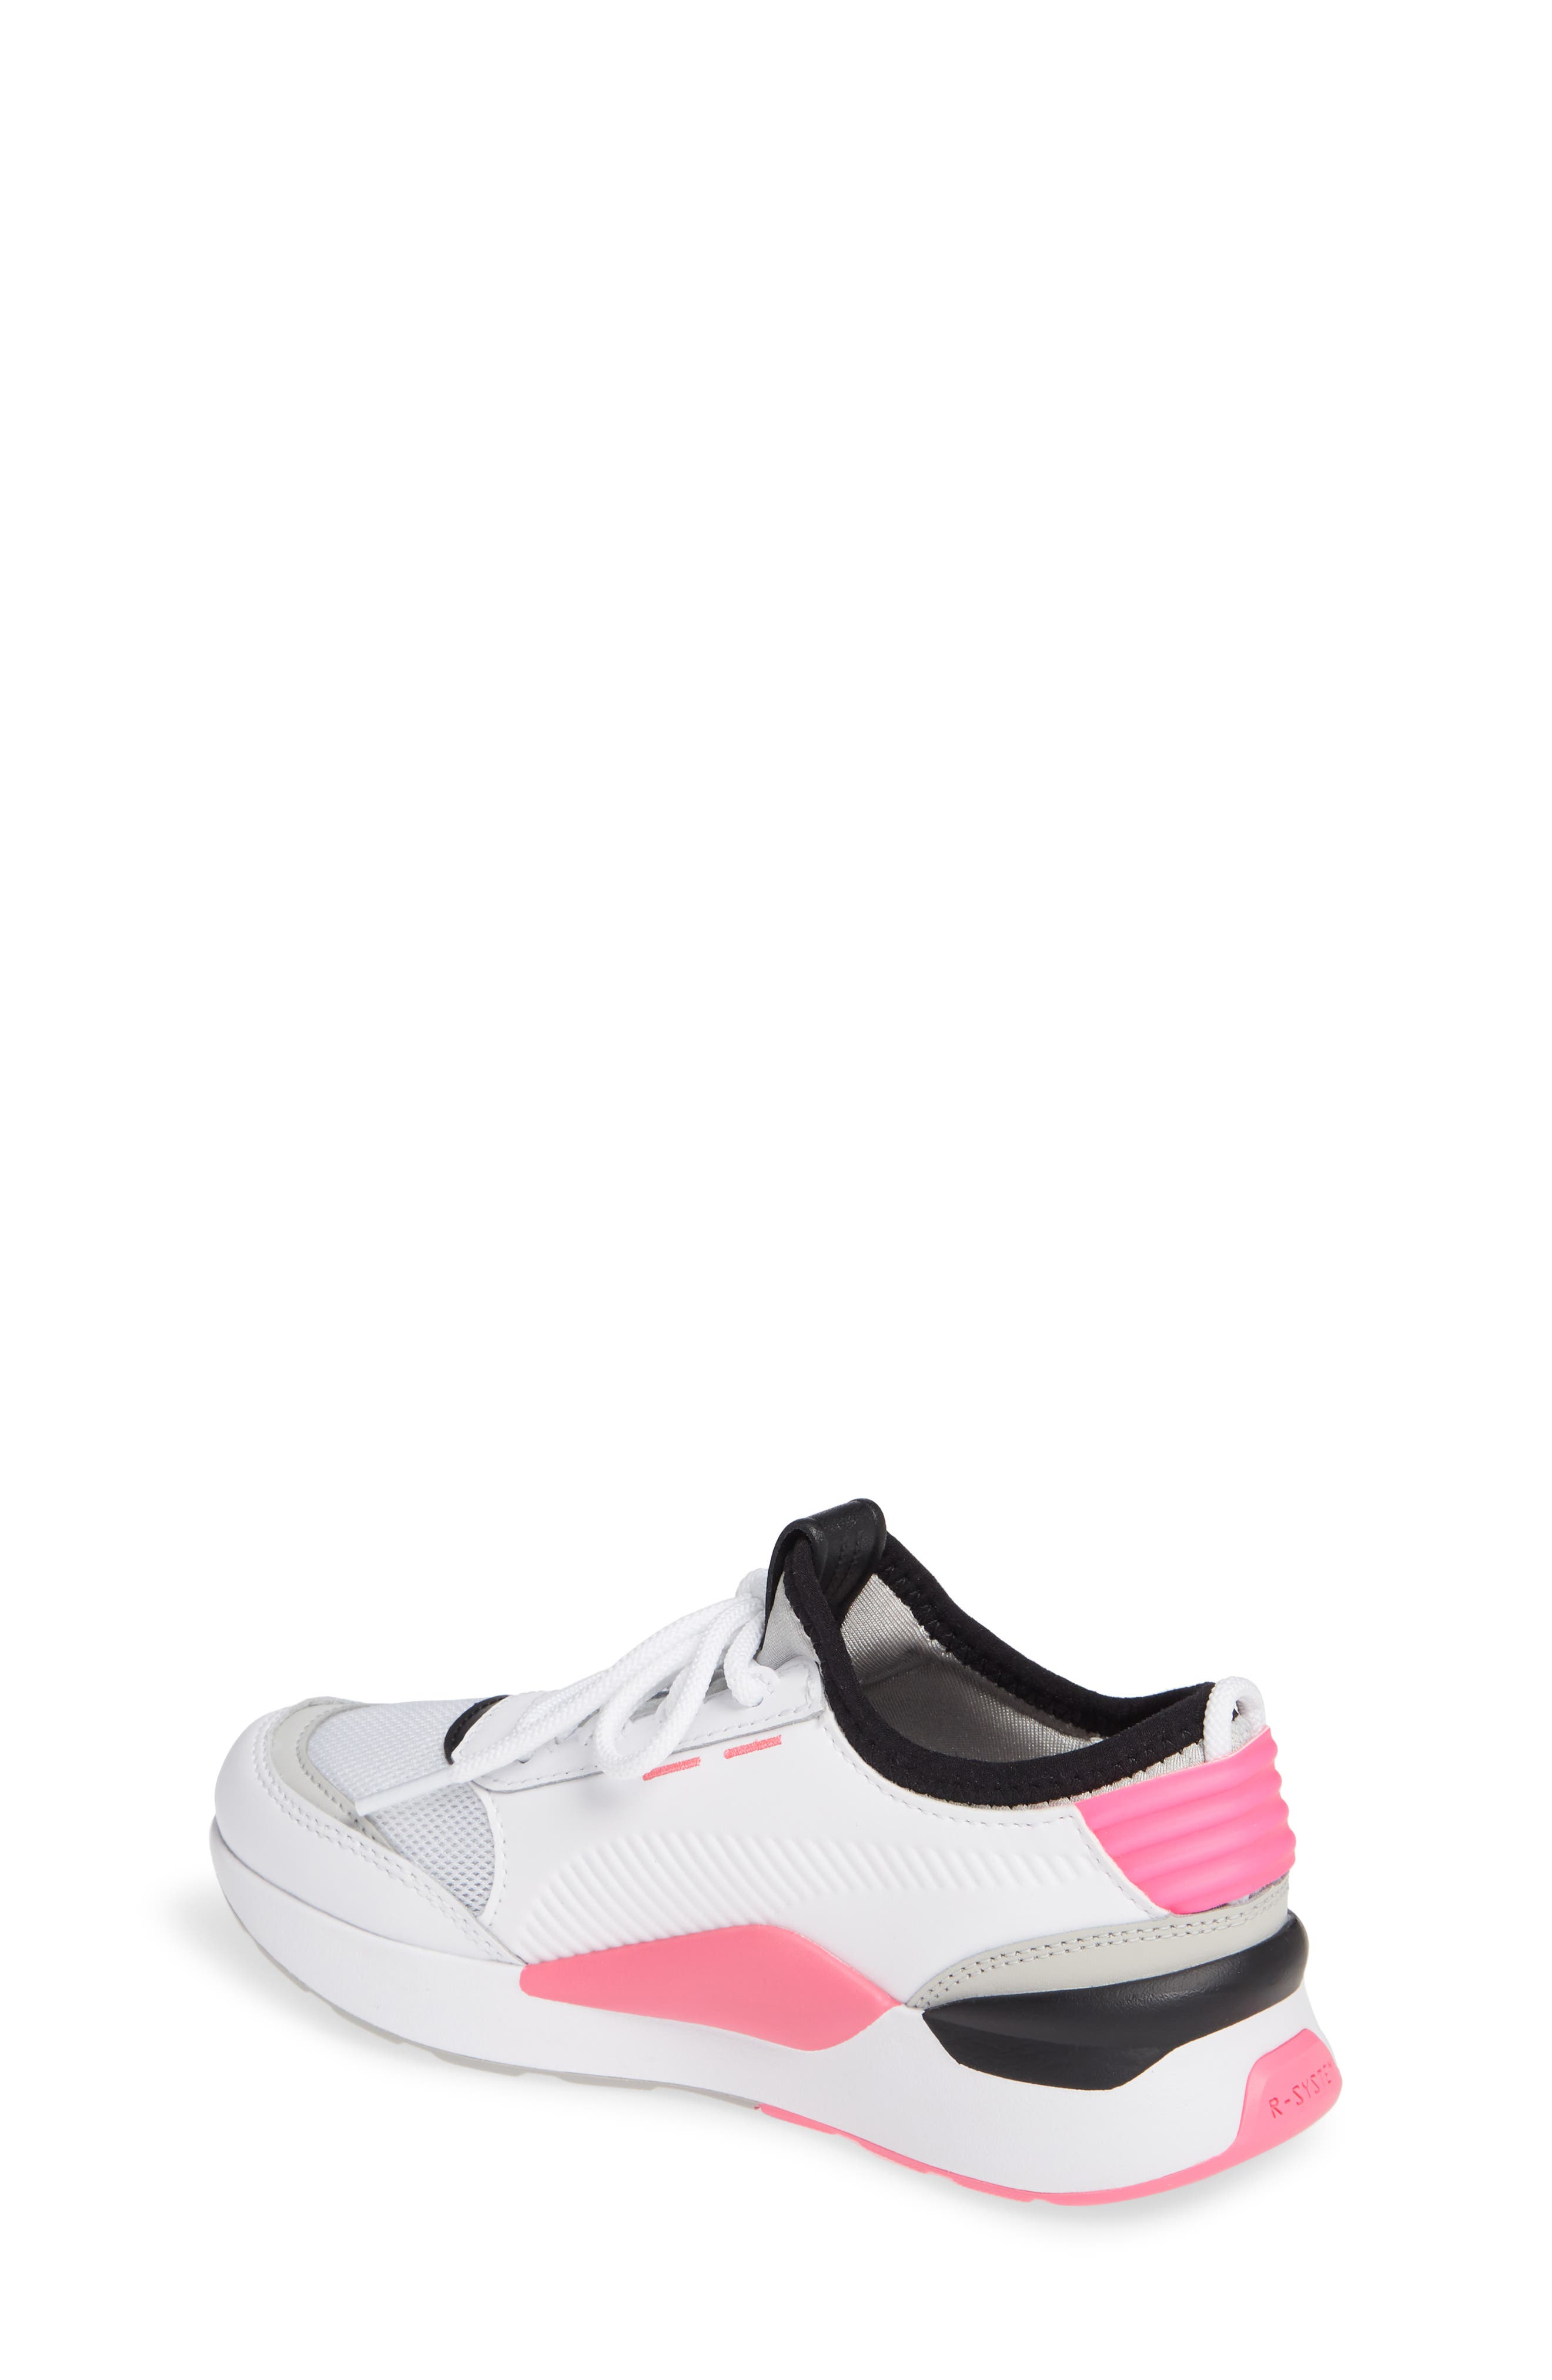 RS-0 Play Sneaker,                             Alternate thumbnail 2, color,                             WHITE/ GRAY VIOLET